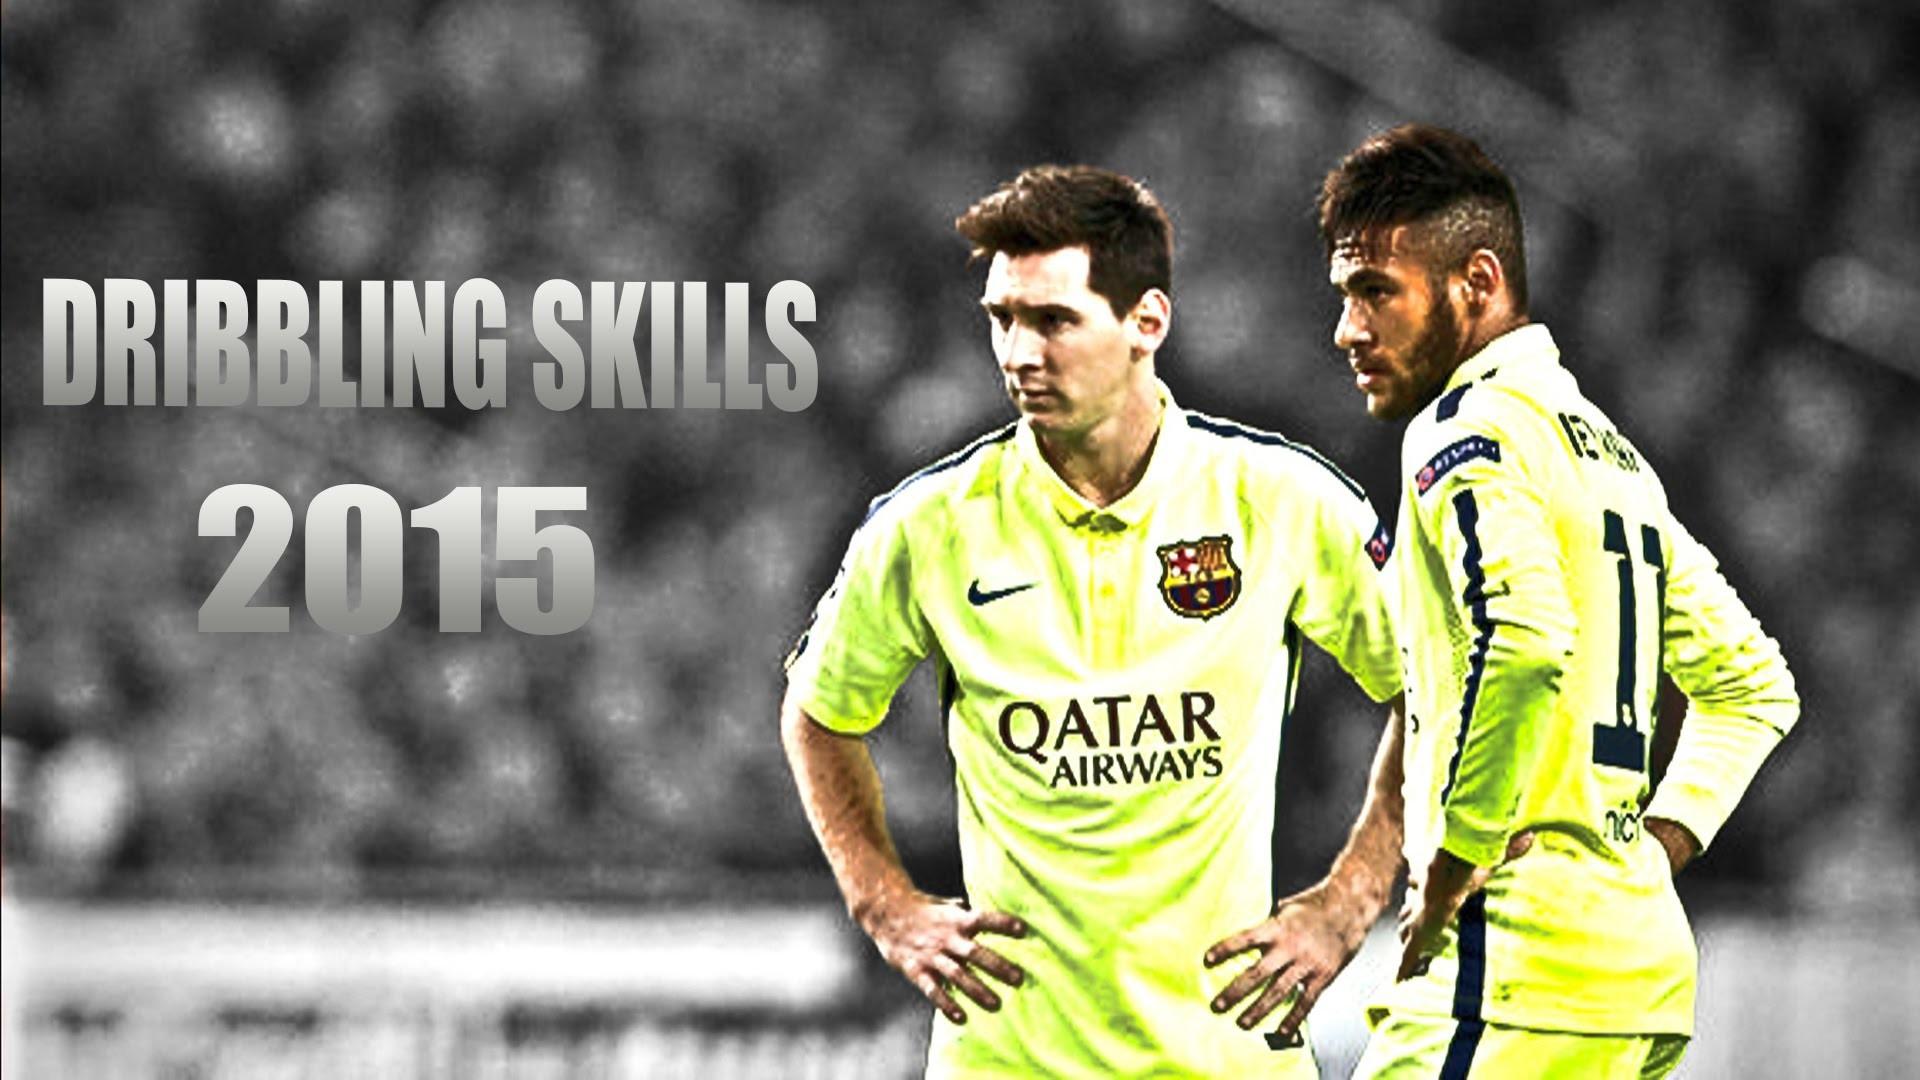 Lionel Messi & Neymar Jr 2015 ○ Insane Dribbling Skills & Runs Show ○ HD –  YouTube